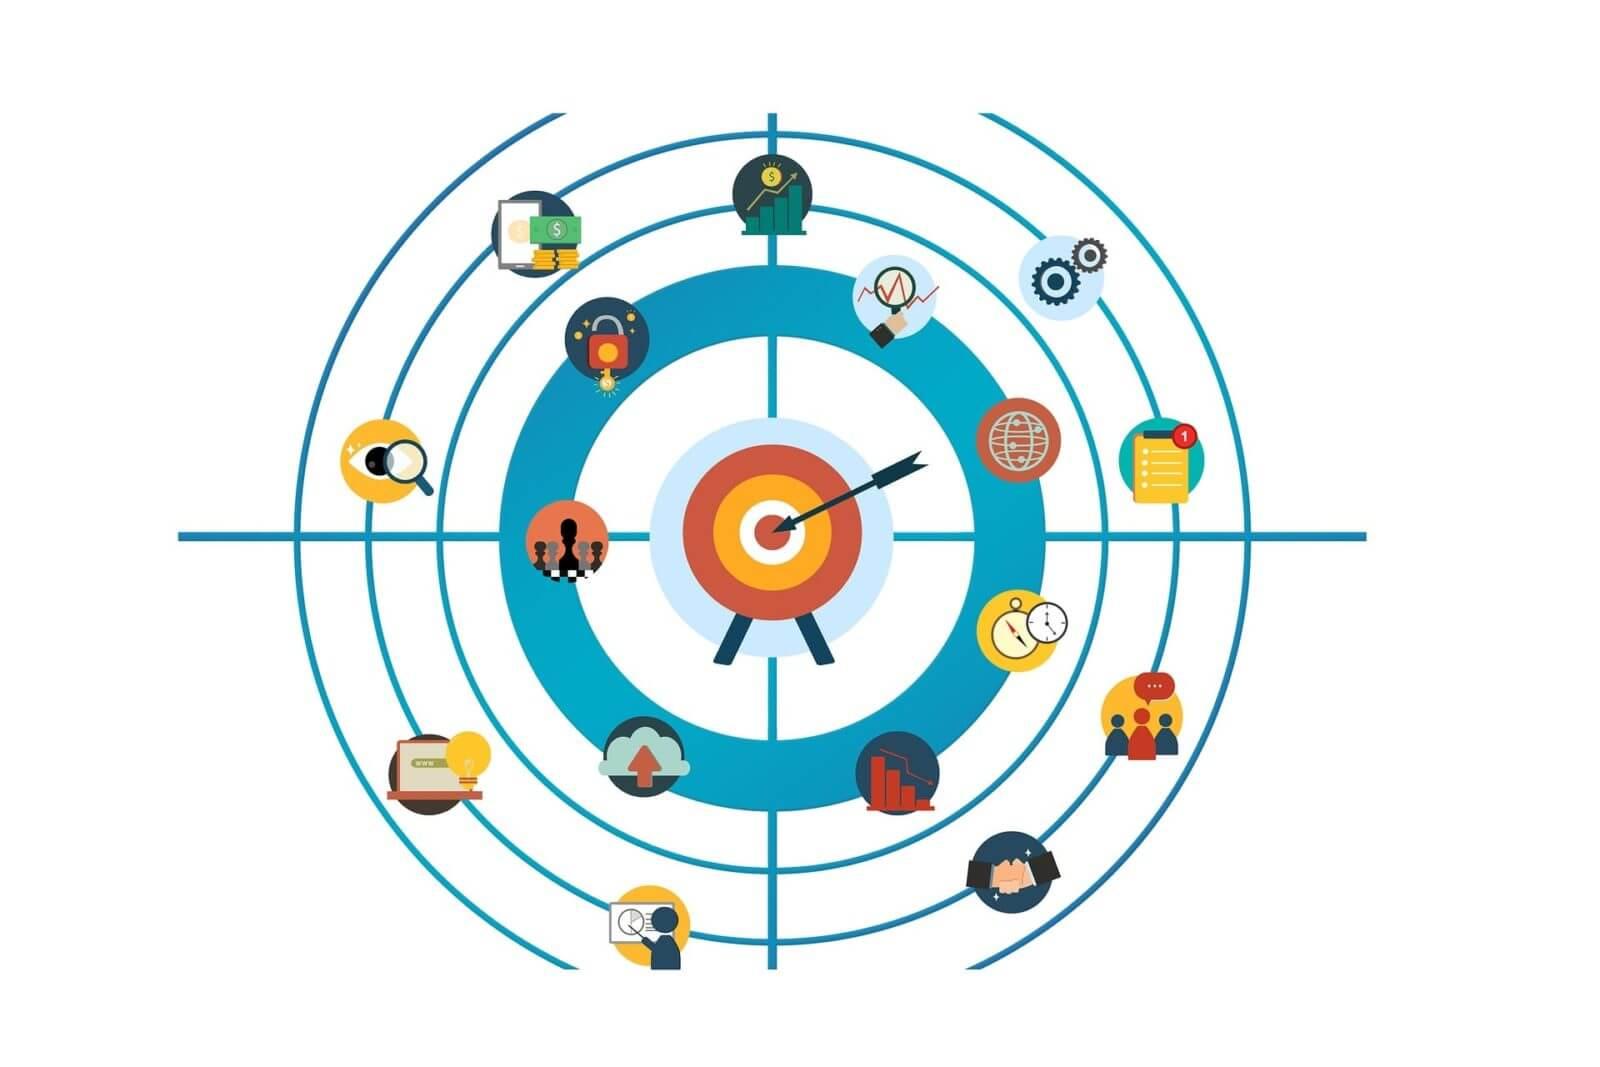 design-thinking-lean-startup-agile